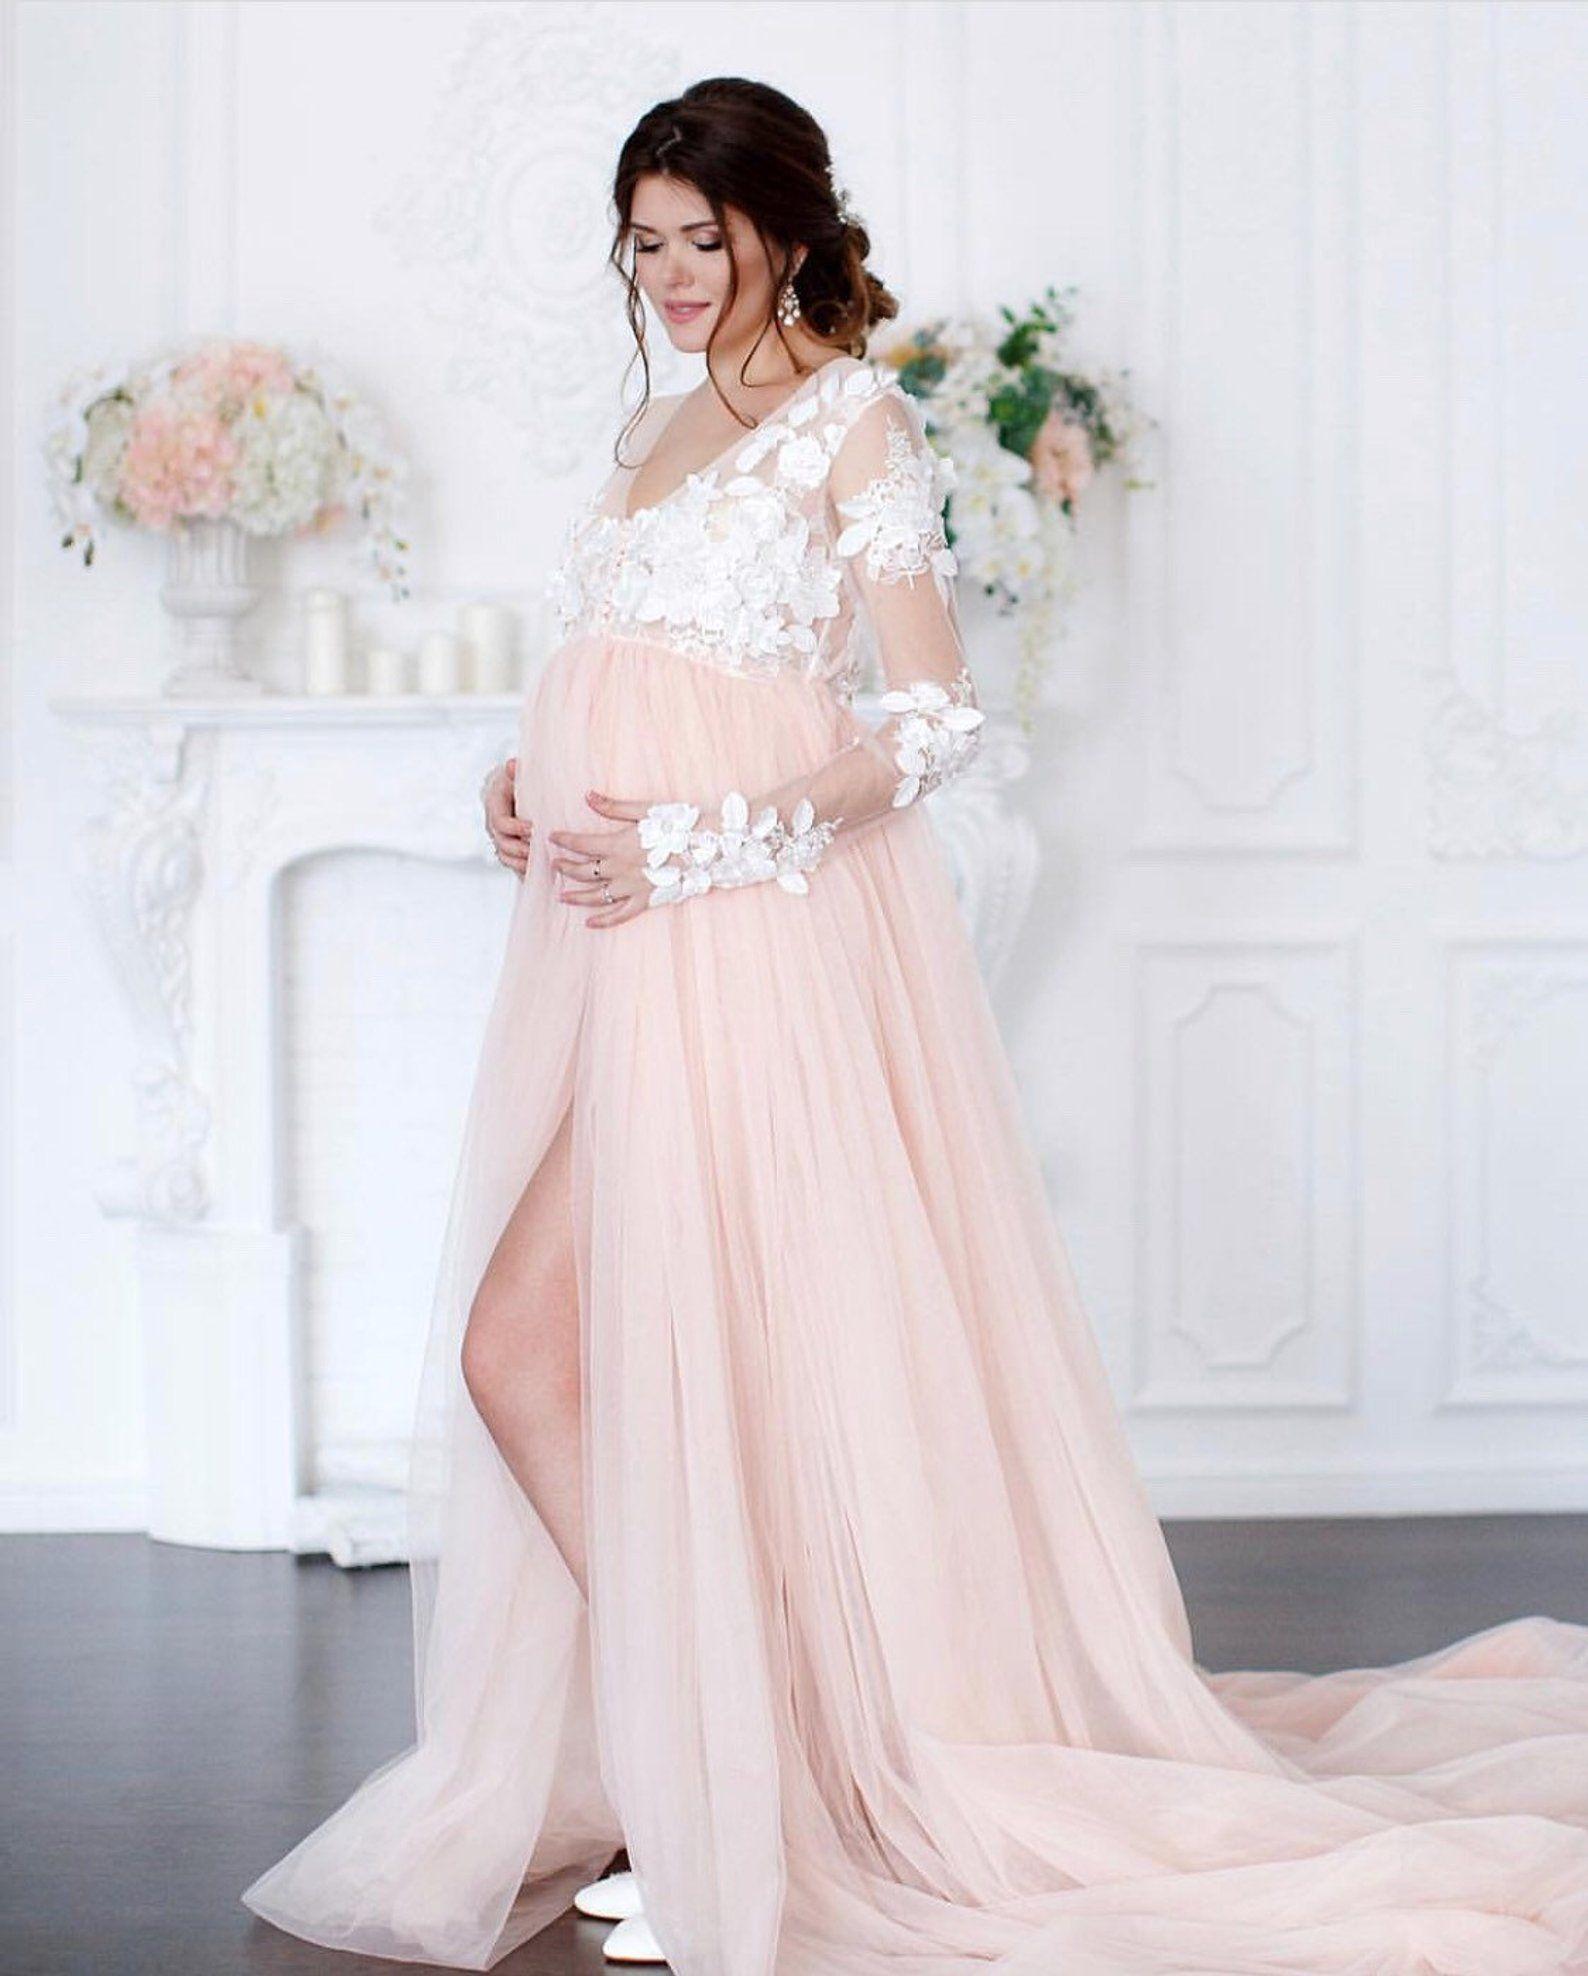 5330a78189 Photoshoot maternity Gown Lace Maternity Dress Maternity Photo ...